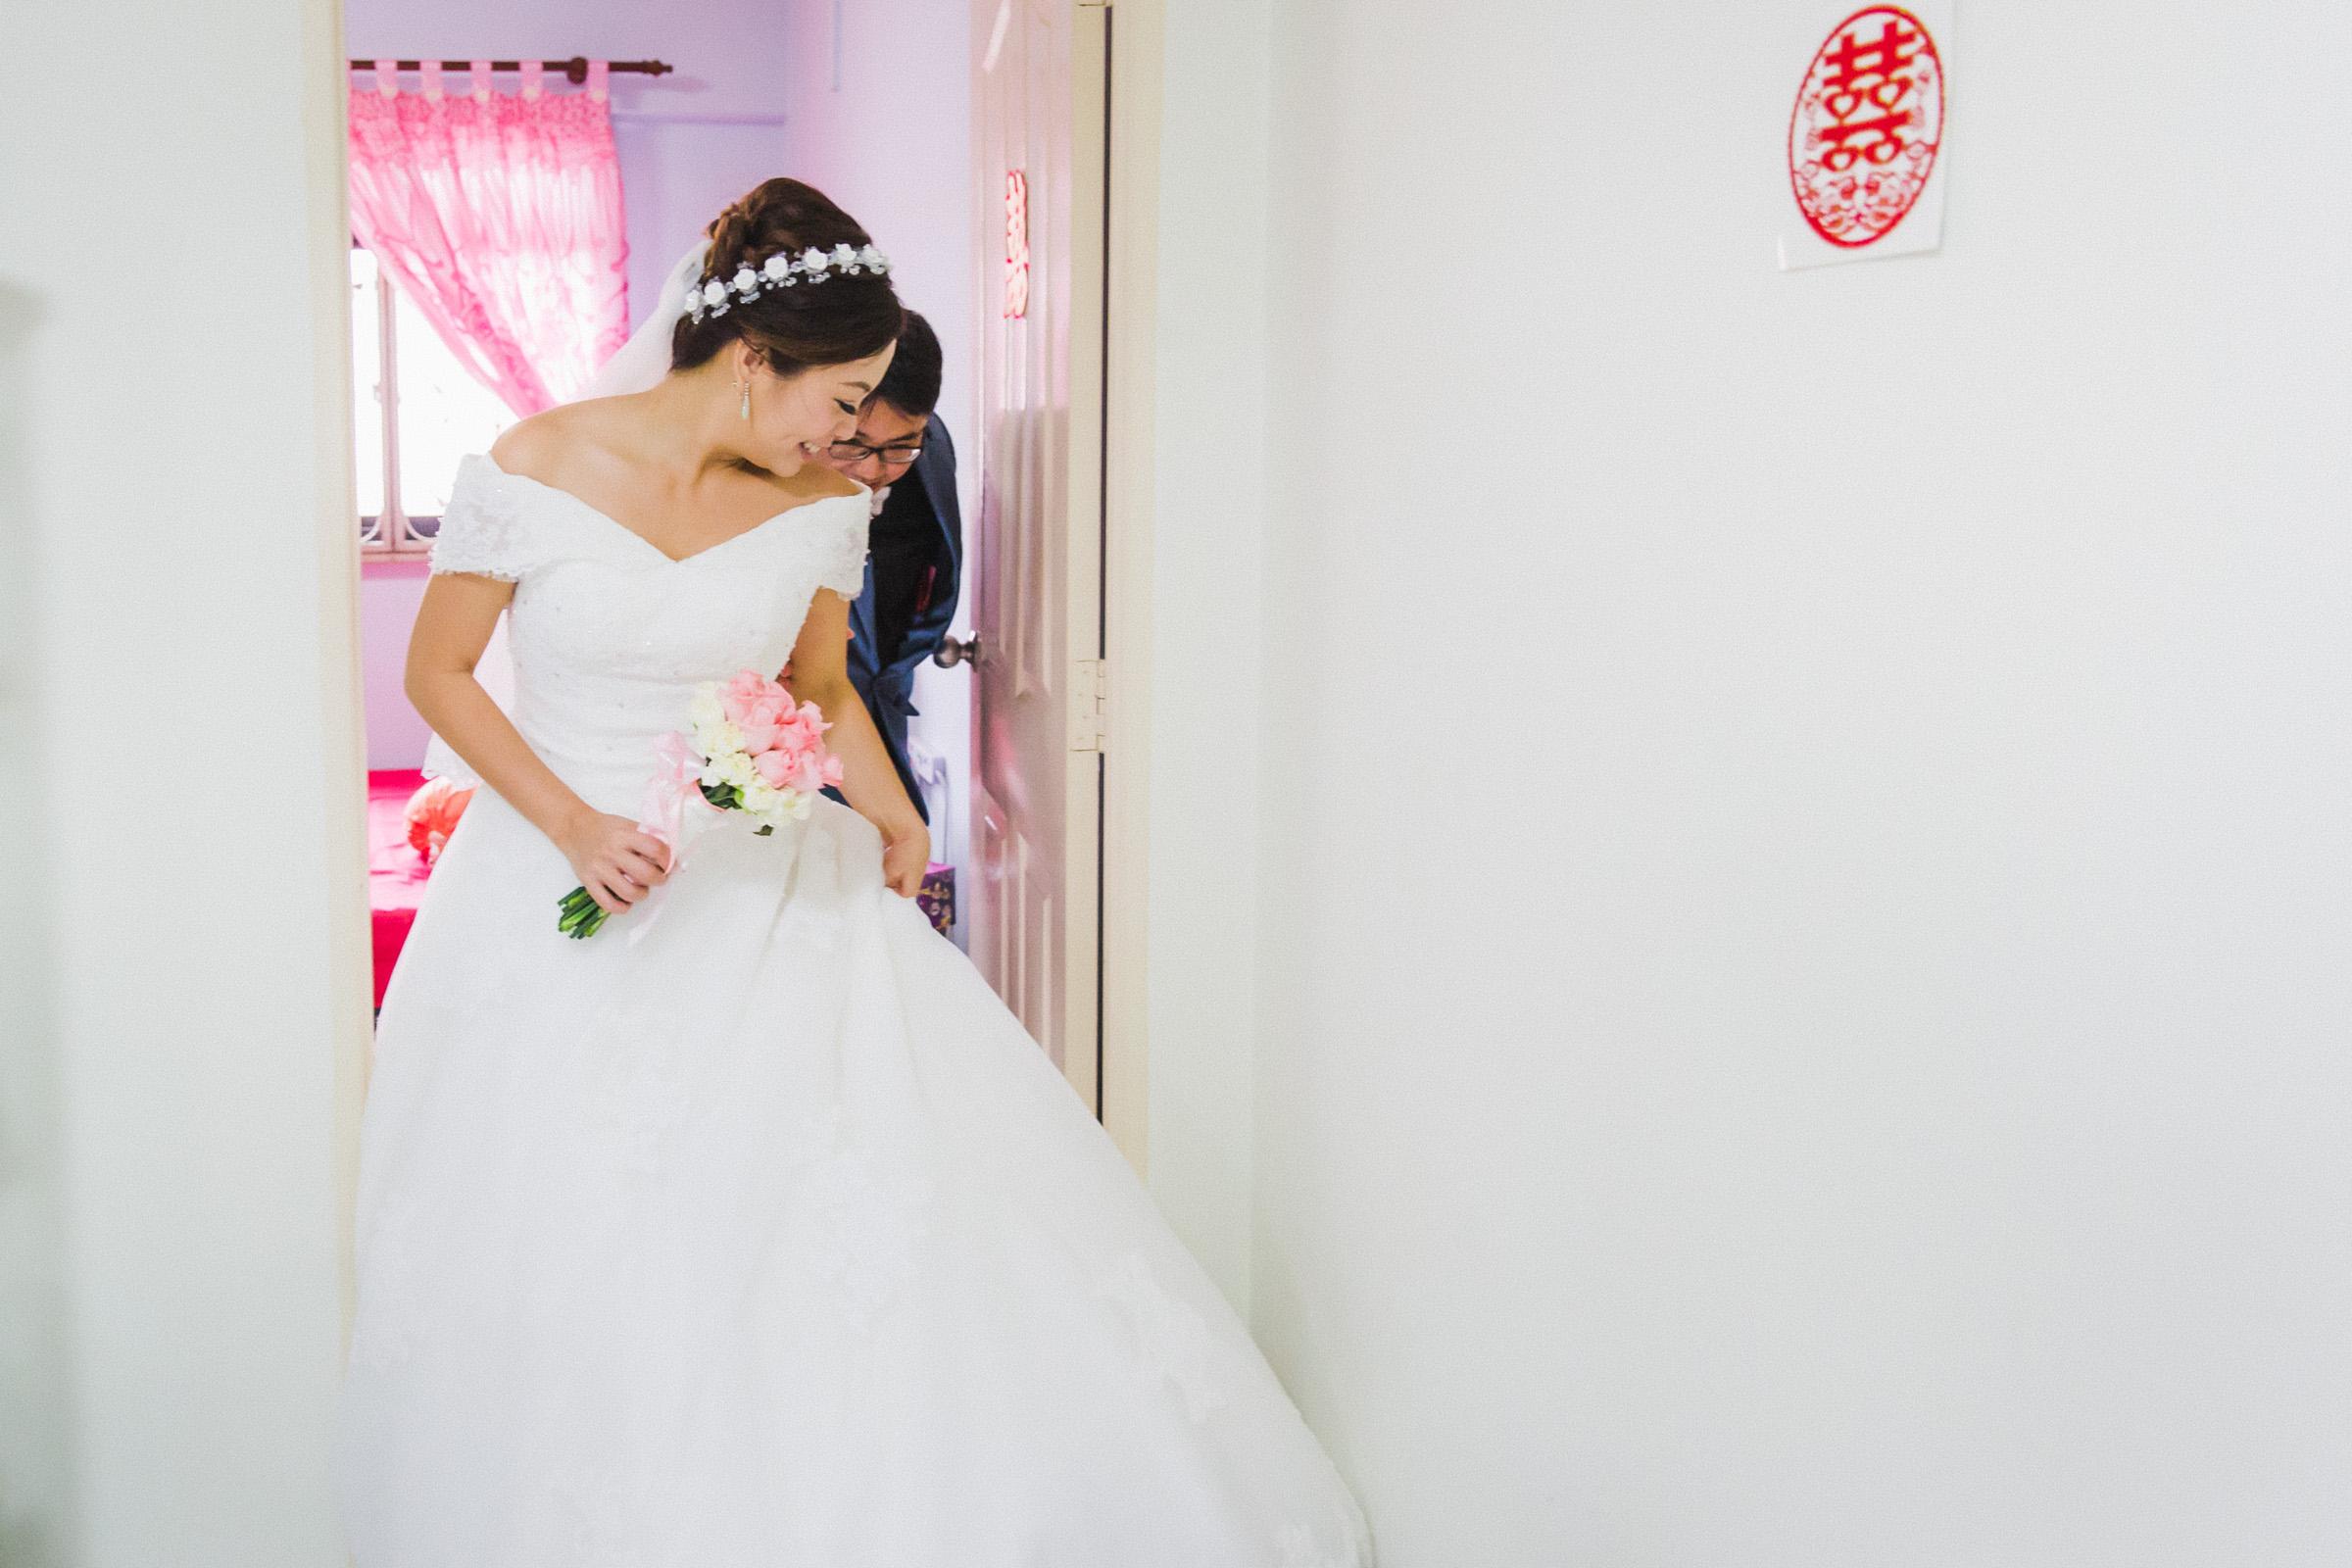 Steven_Jasmine_Wedding_Walldrobe Photography_Wedding shoots_Actual day wedding_Photographer (16)